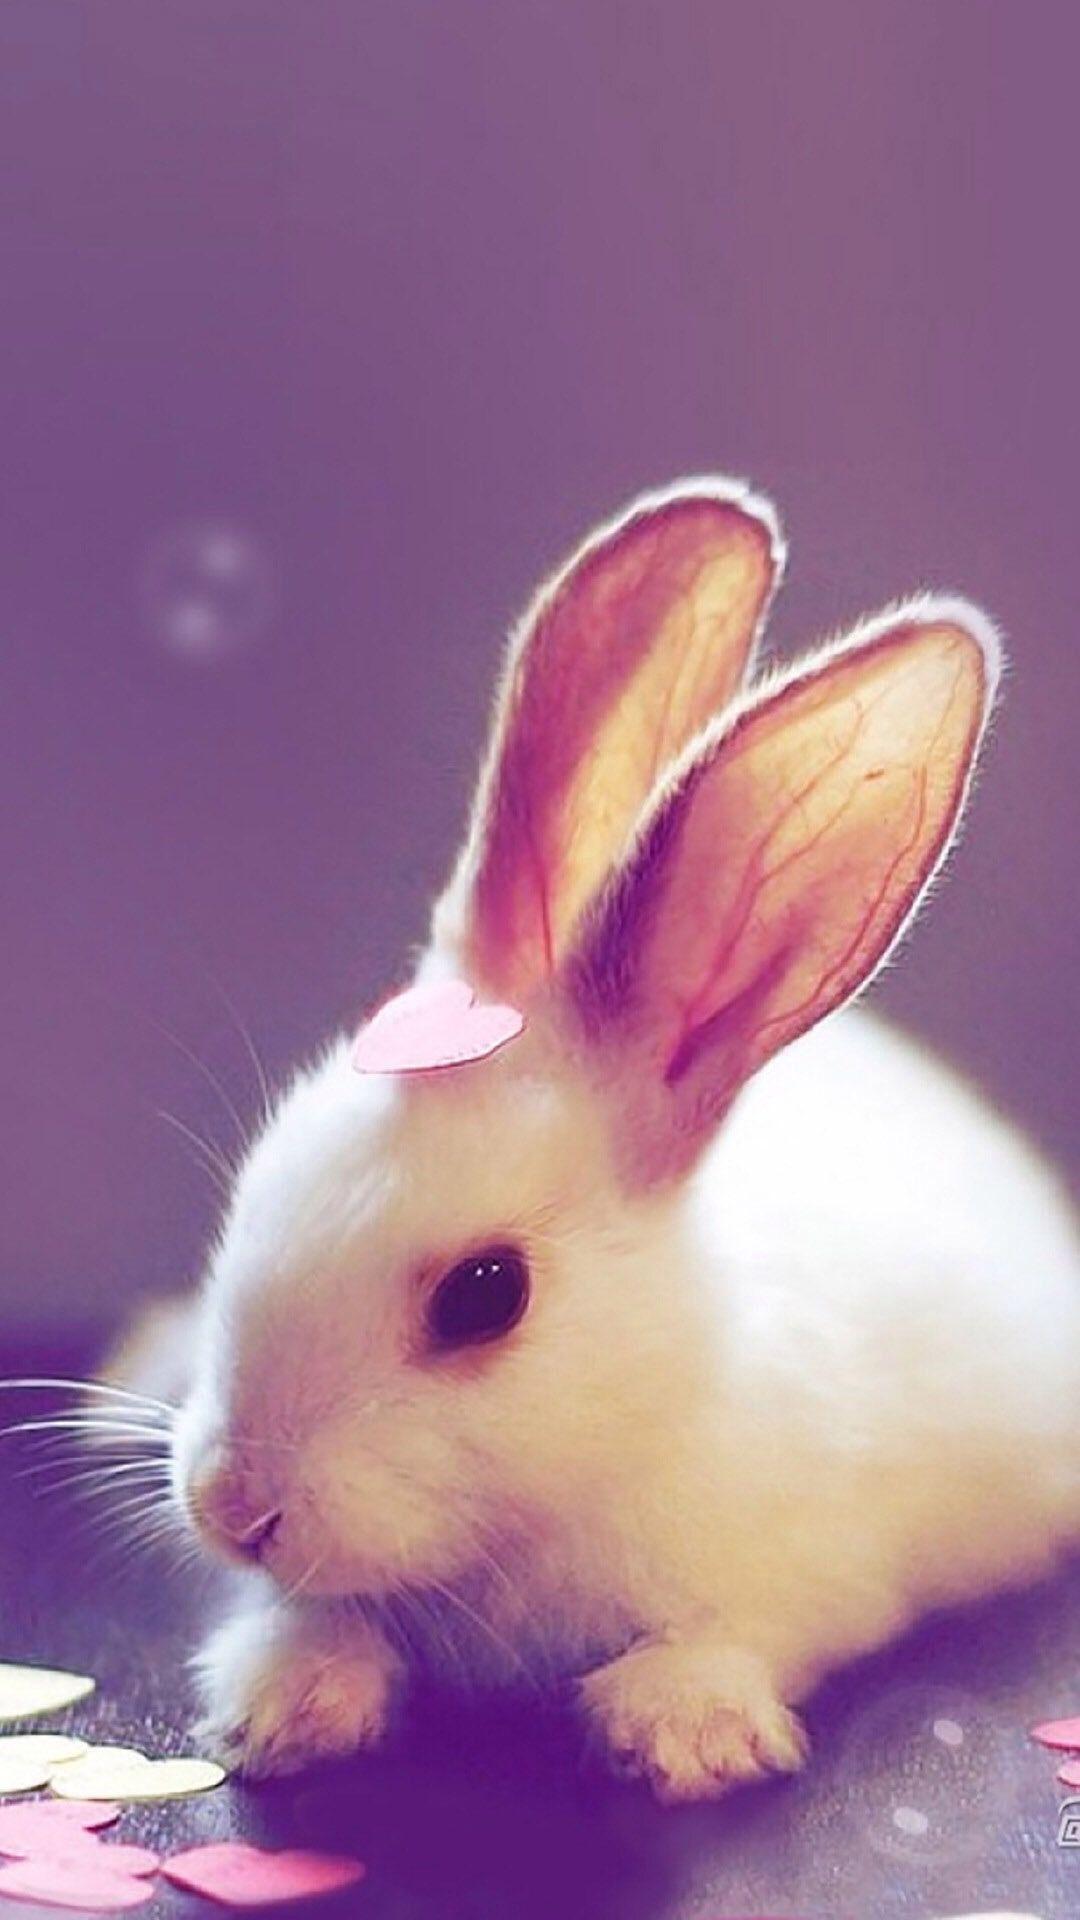 Bunny Rabbit Phone Wallpaper Animals Animal Wallpaper Cute Animal Pictures